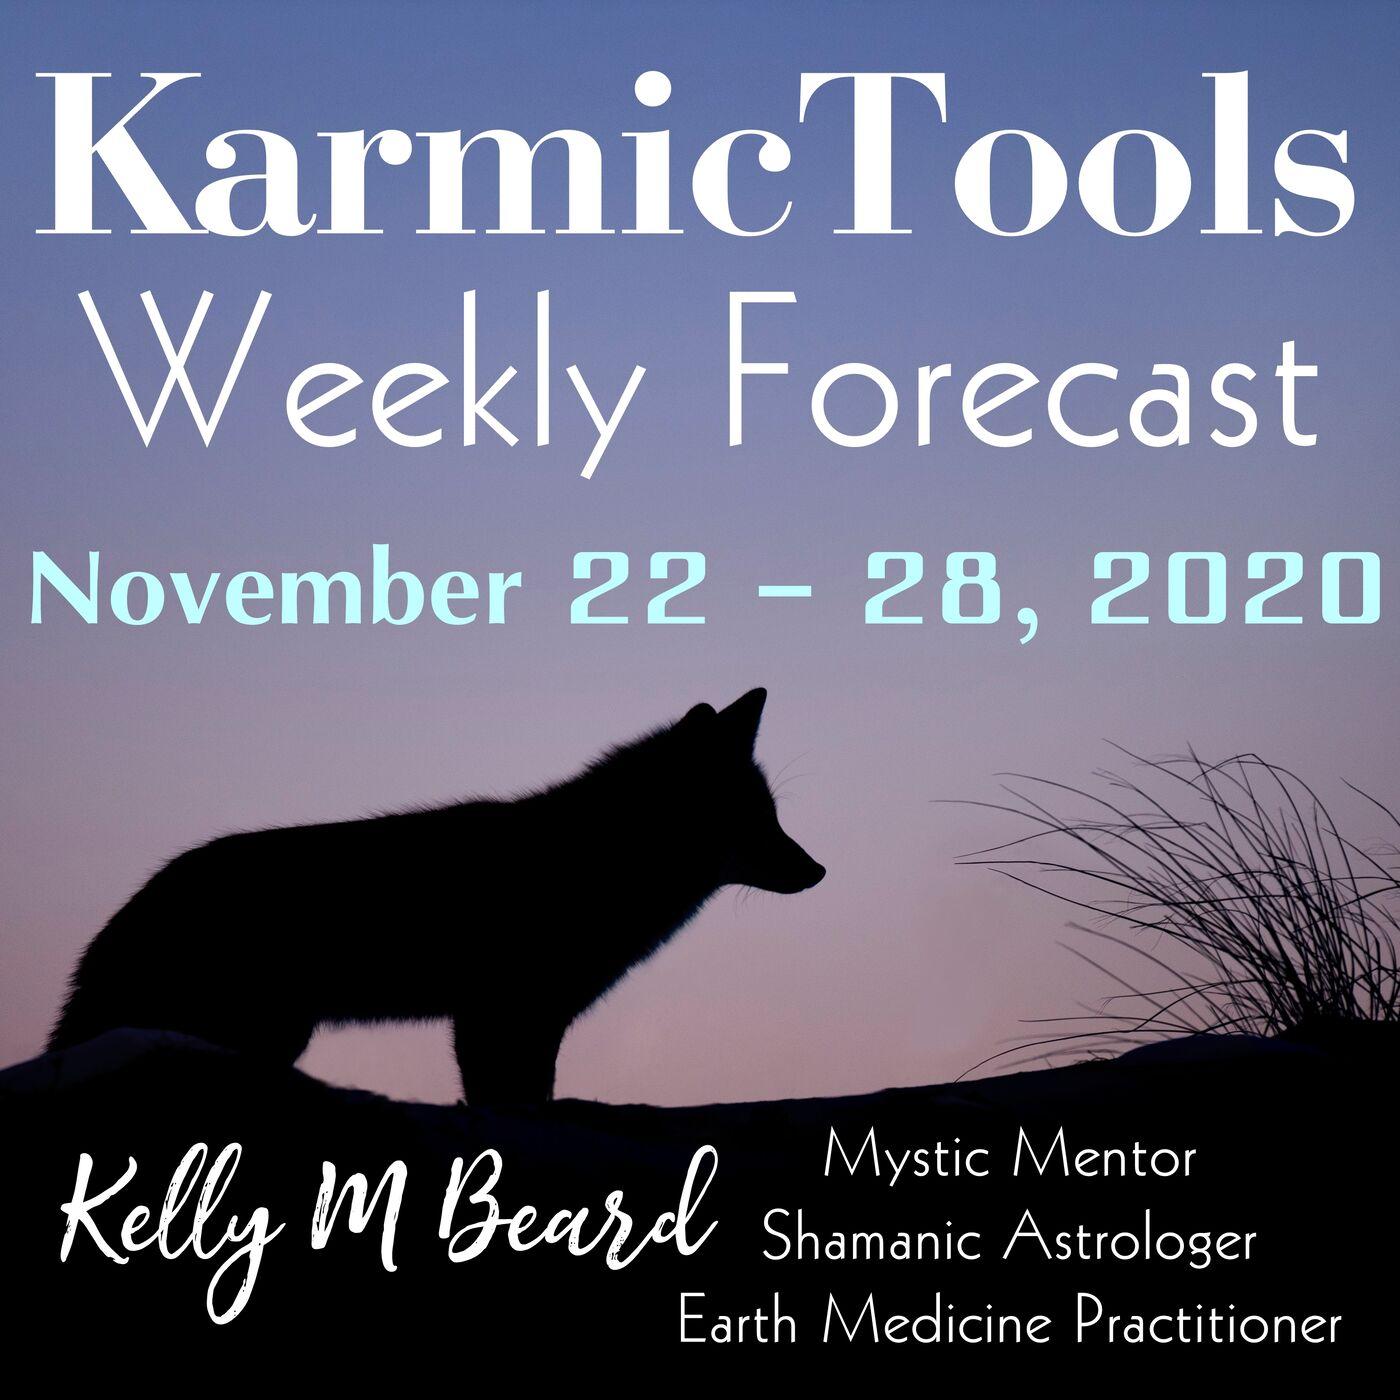 Nov 22 - 28, 2020 KarmicTools Weekly Forecast